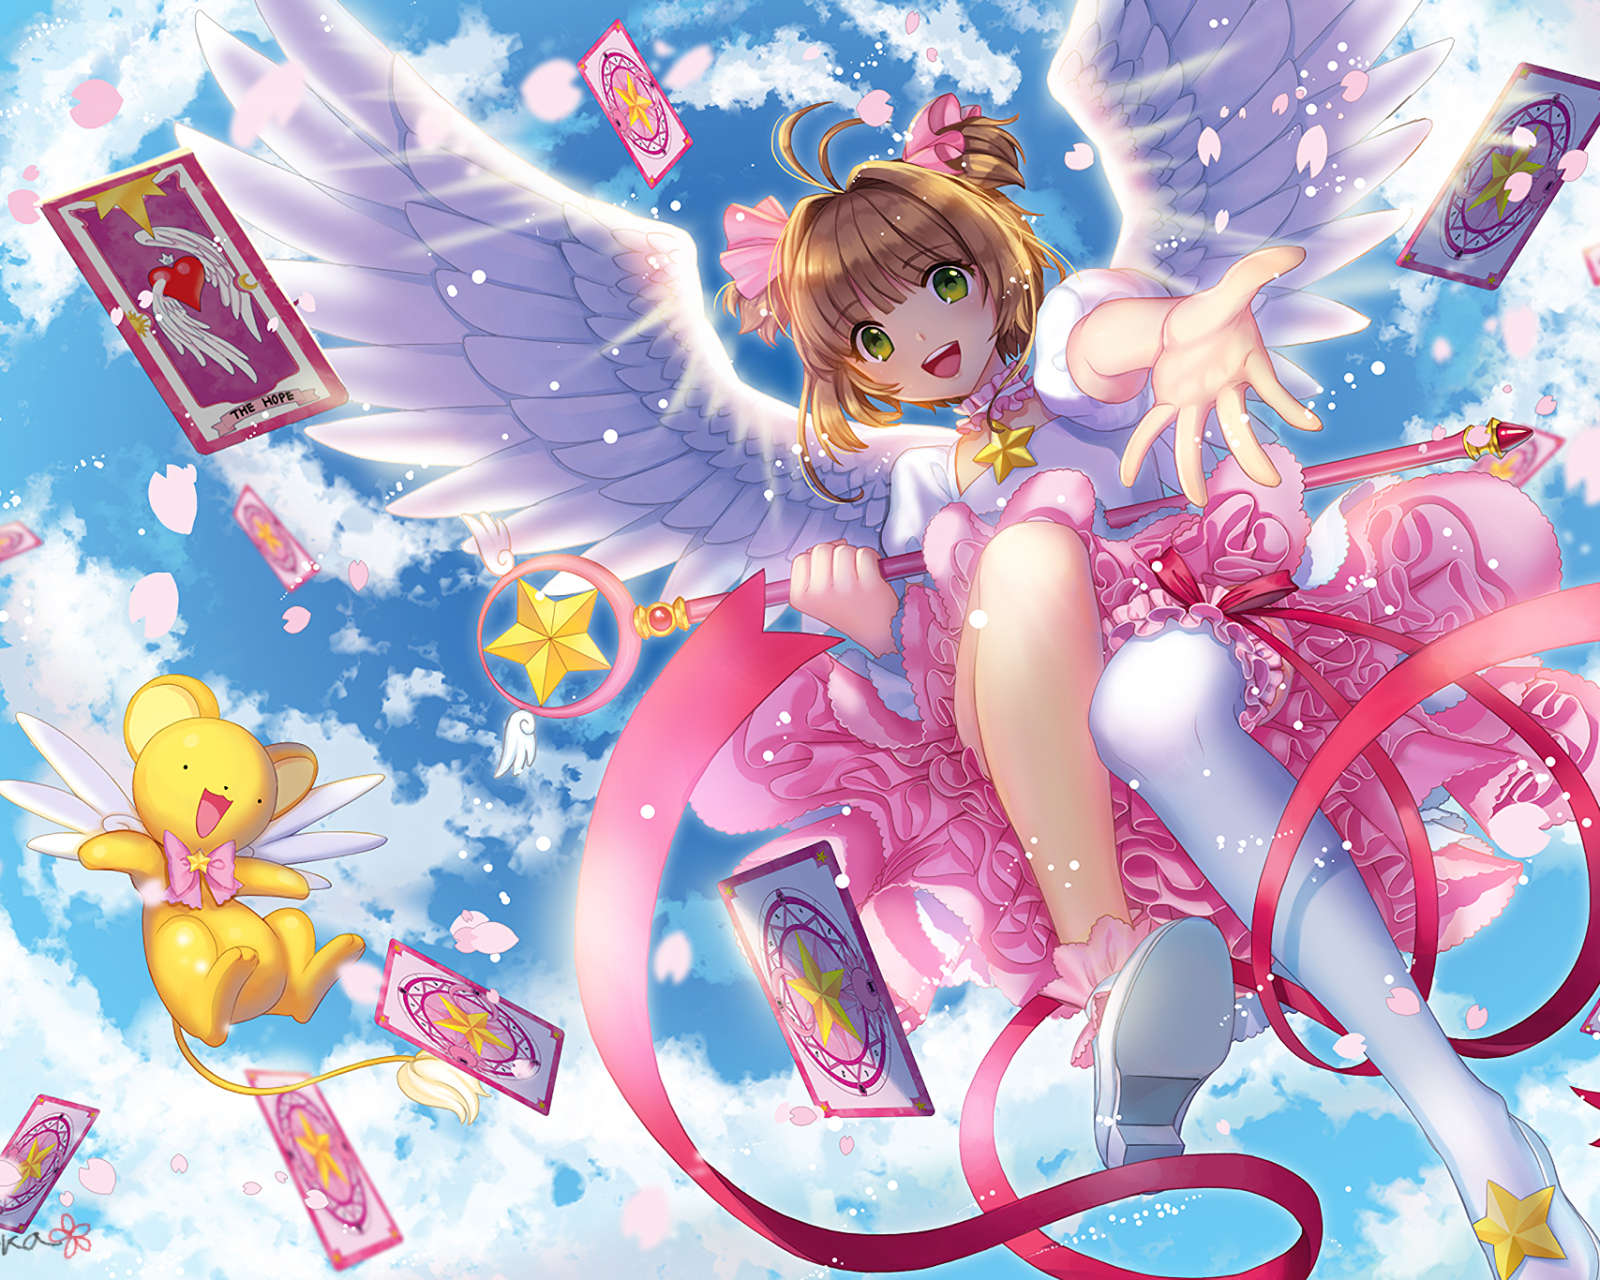 [31+] Cardcaptor Sakura Wallpapers on WallpaperSafari